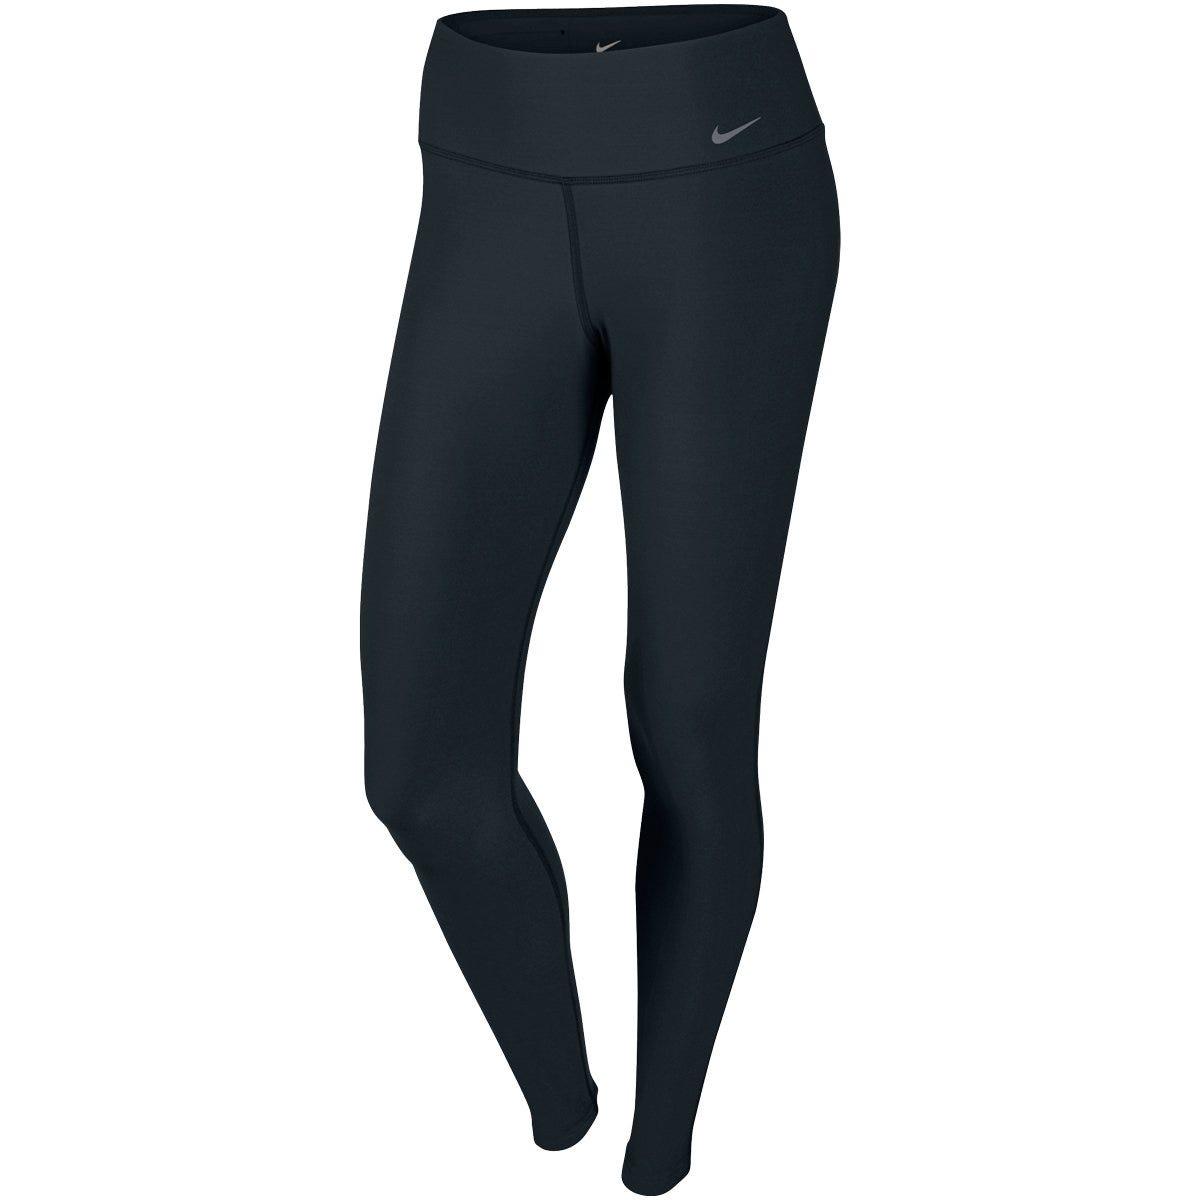 Legend 2.0 Tight-Fit Softball Training Pants by Nike; Womens XL Black